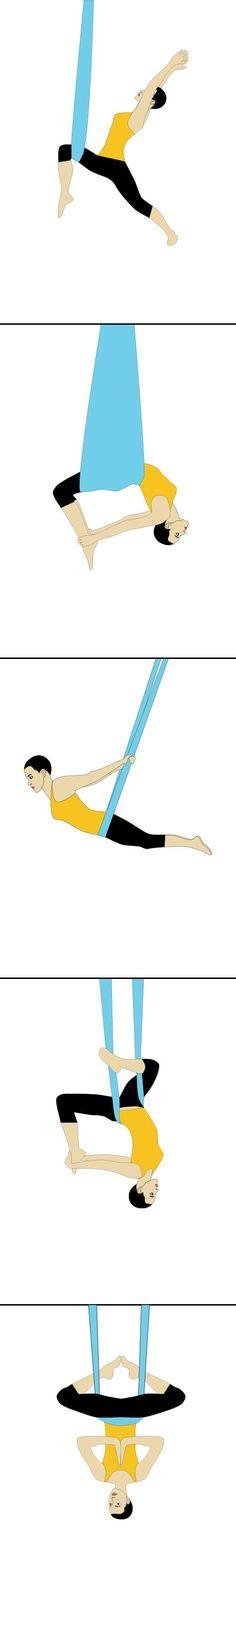 Aerial Yoga Poses, Pose Guide! Antigravity Yoga – Get the at Home Aerial Yoga Kit on Amazon.com!